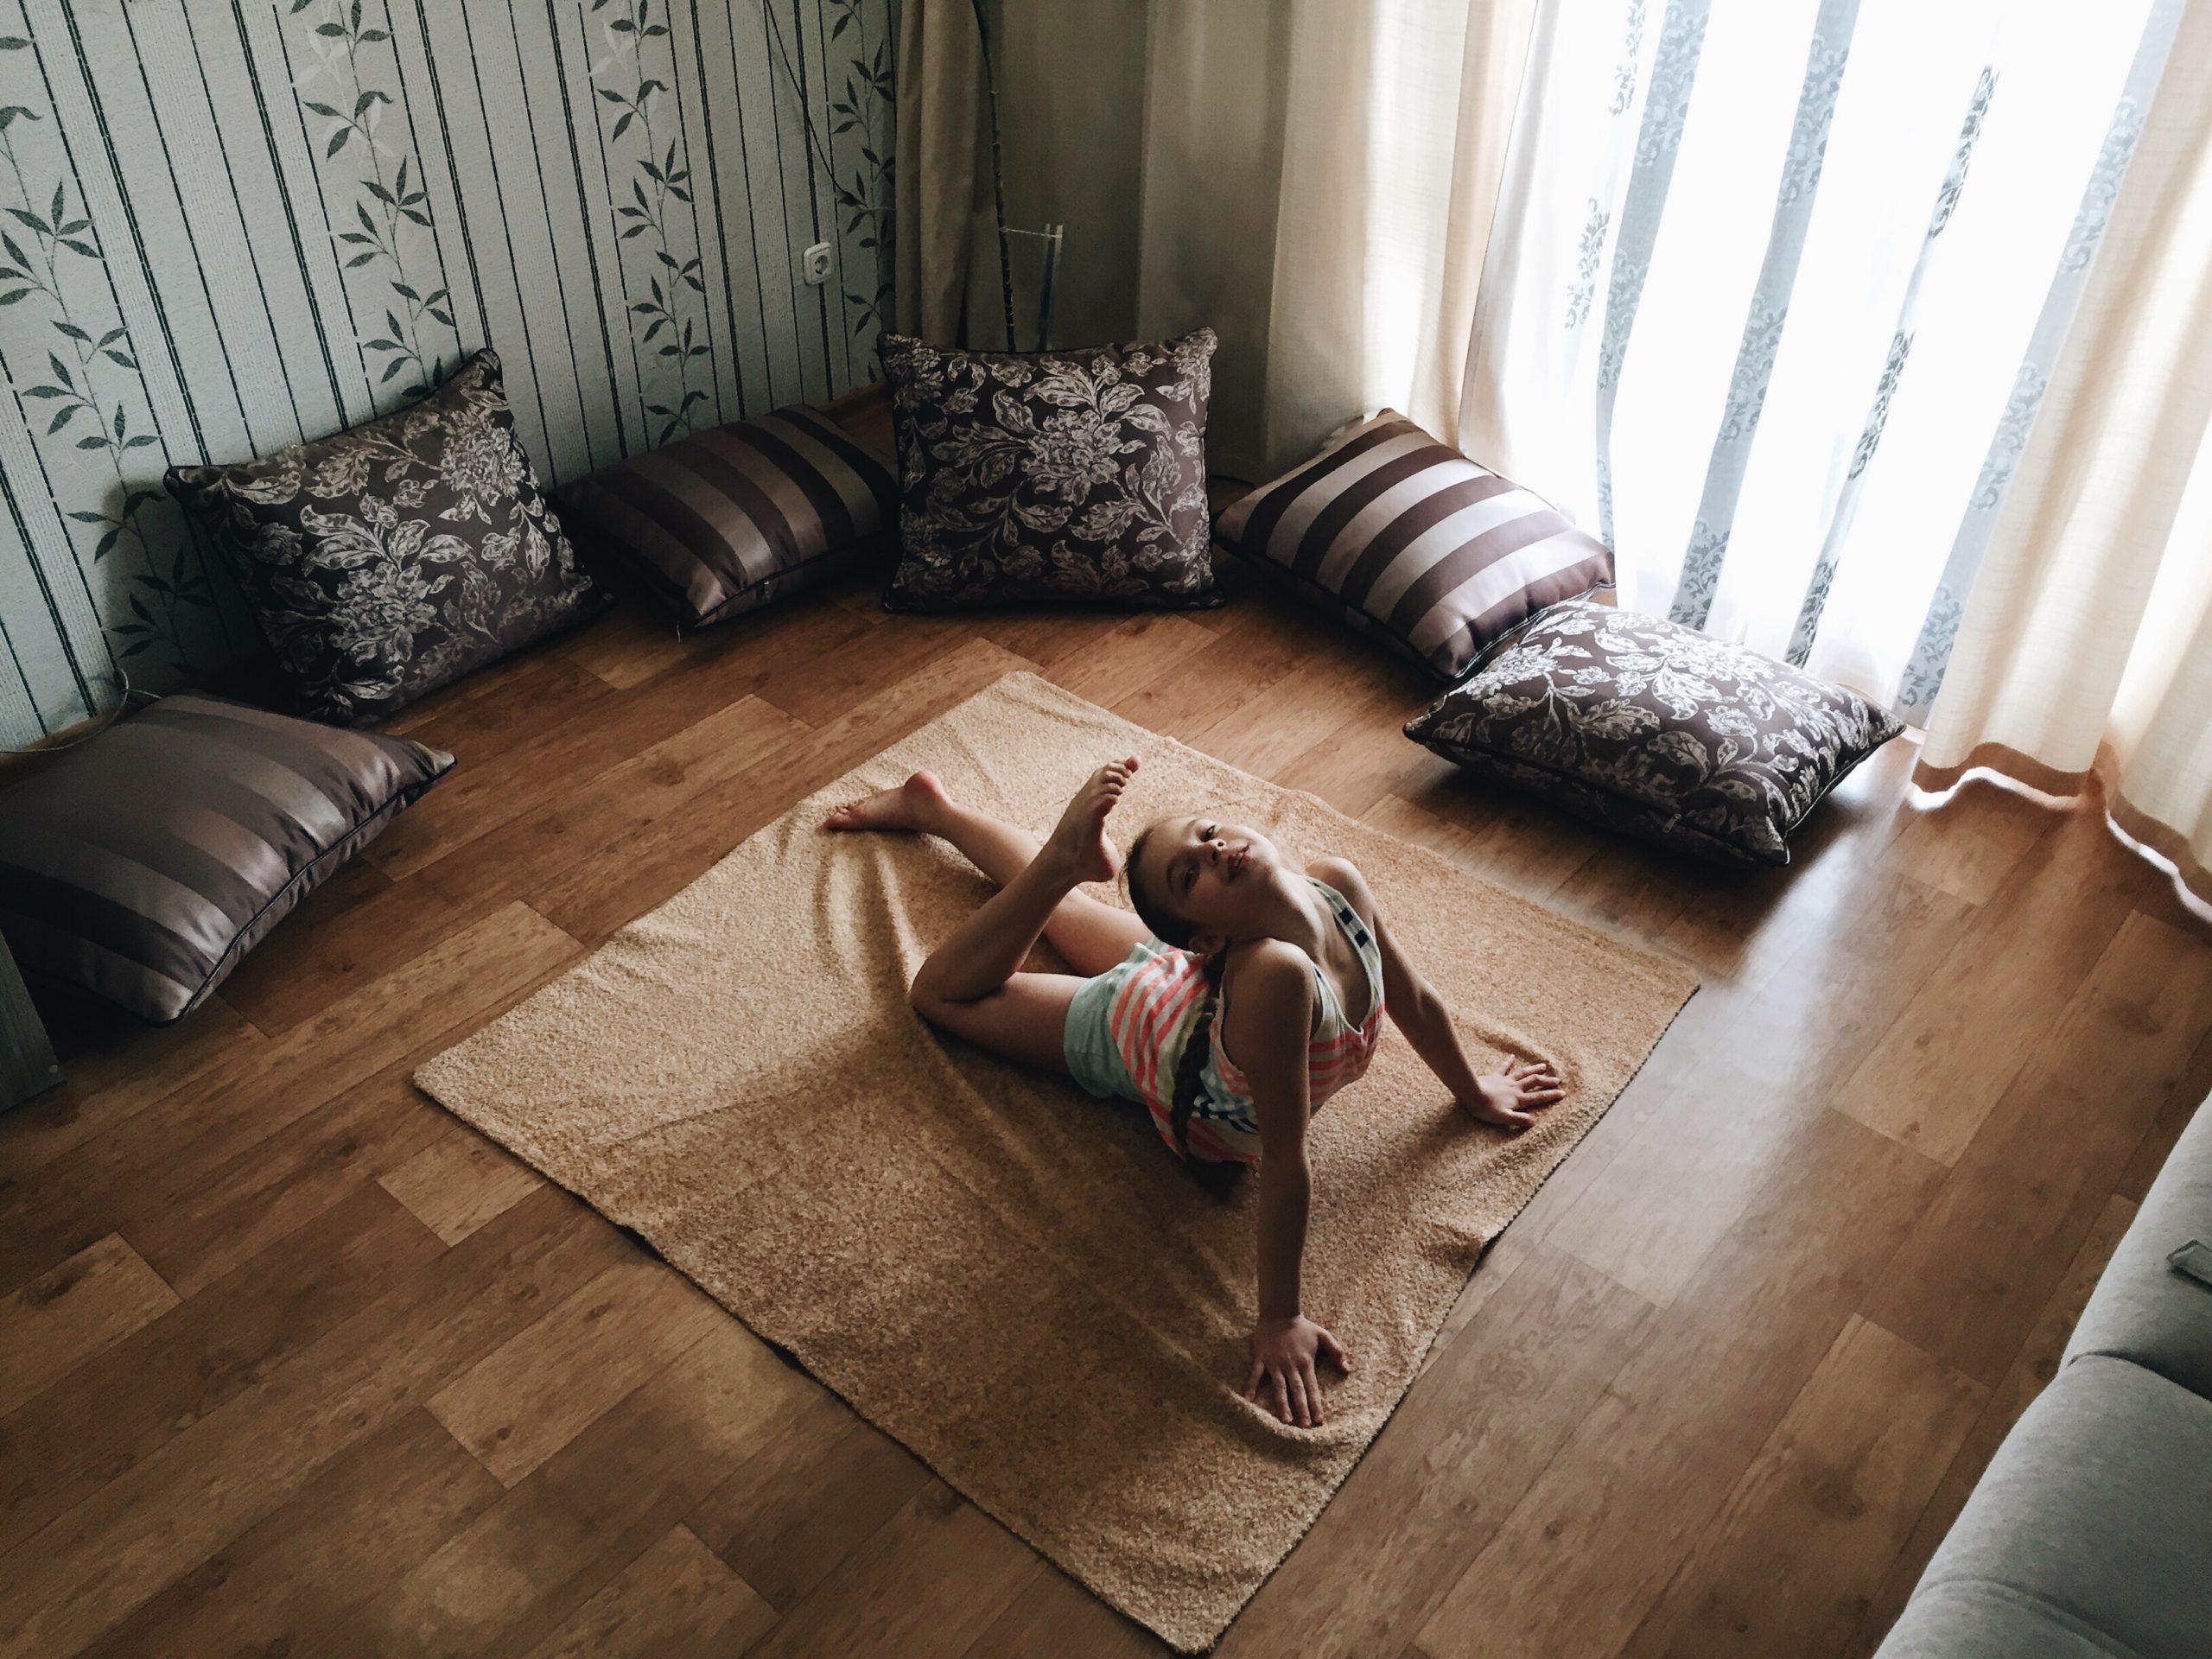 Crea un espacio agradable para practicar yoga en casa